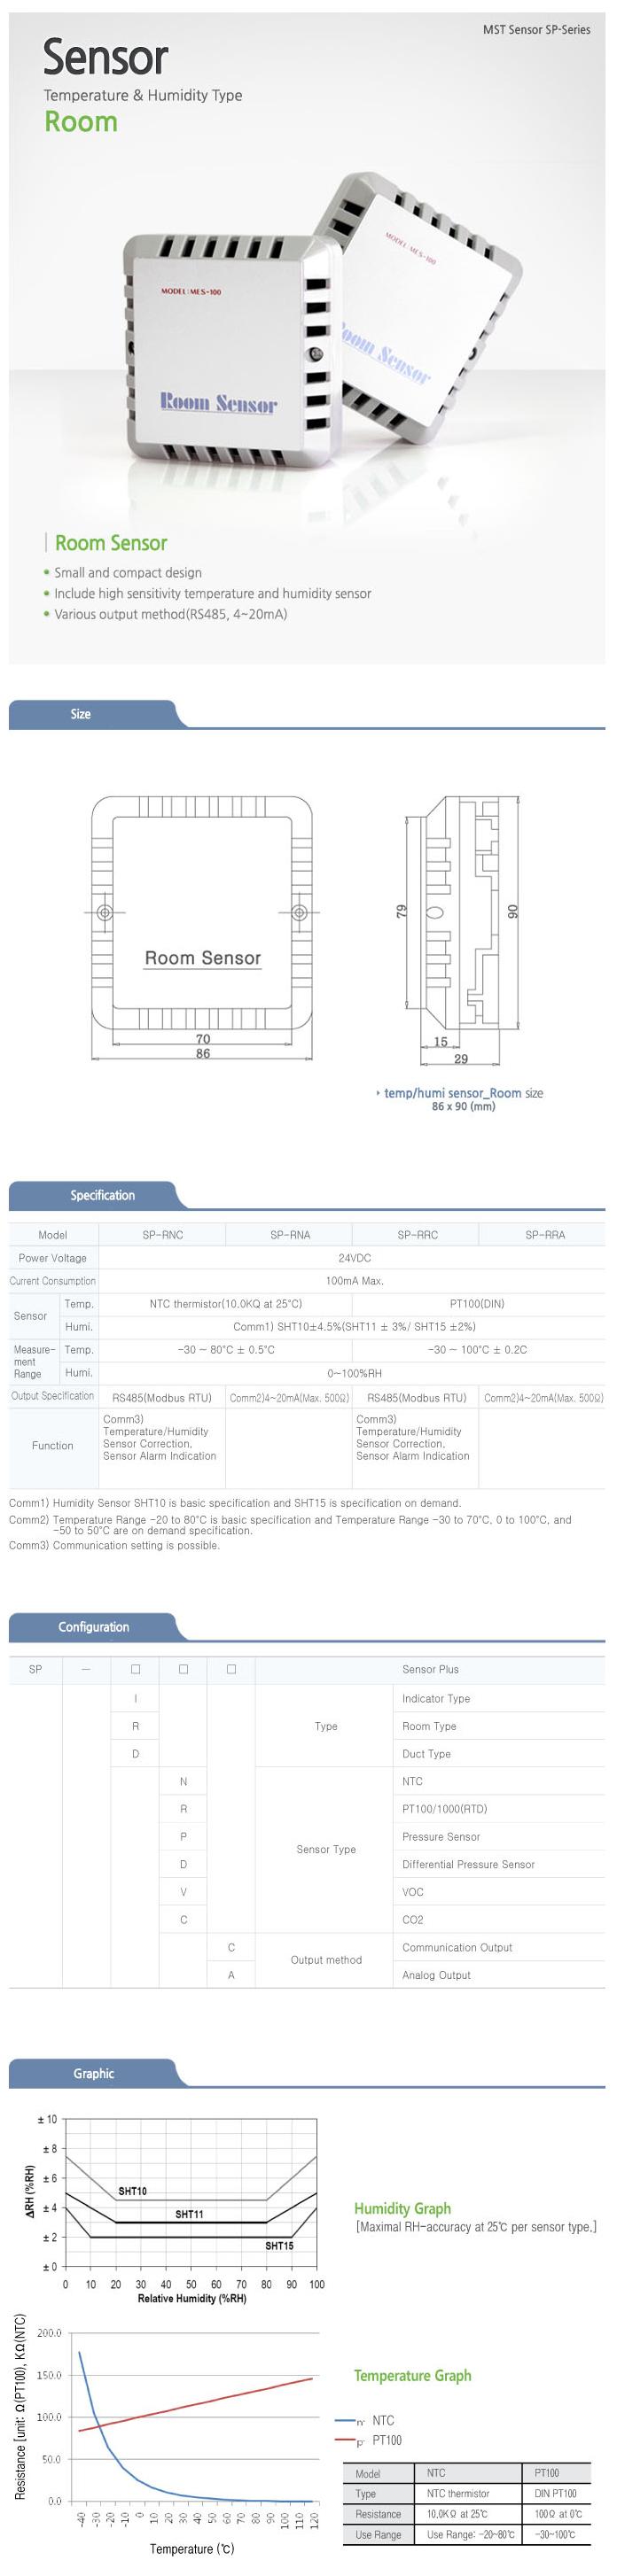 MST Temperature / Humidity Sensor (Room) SP Series